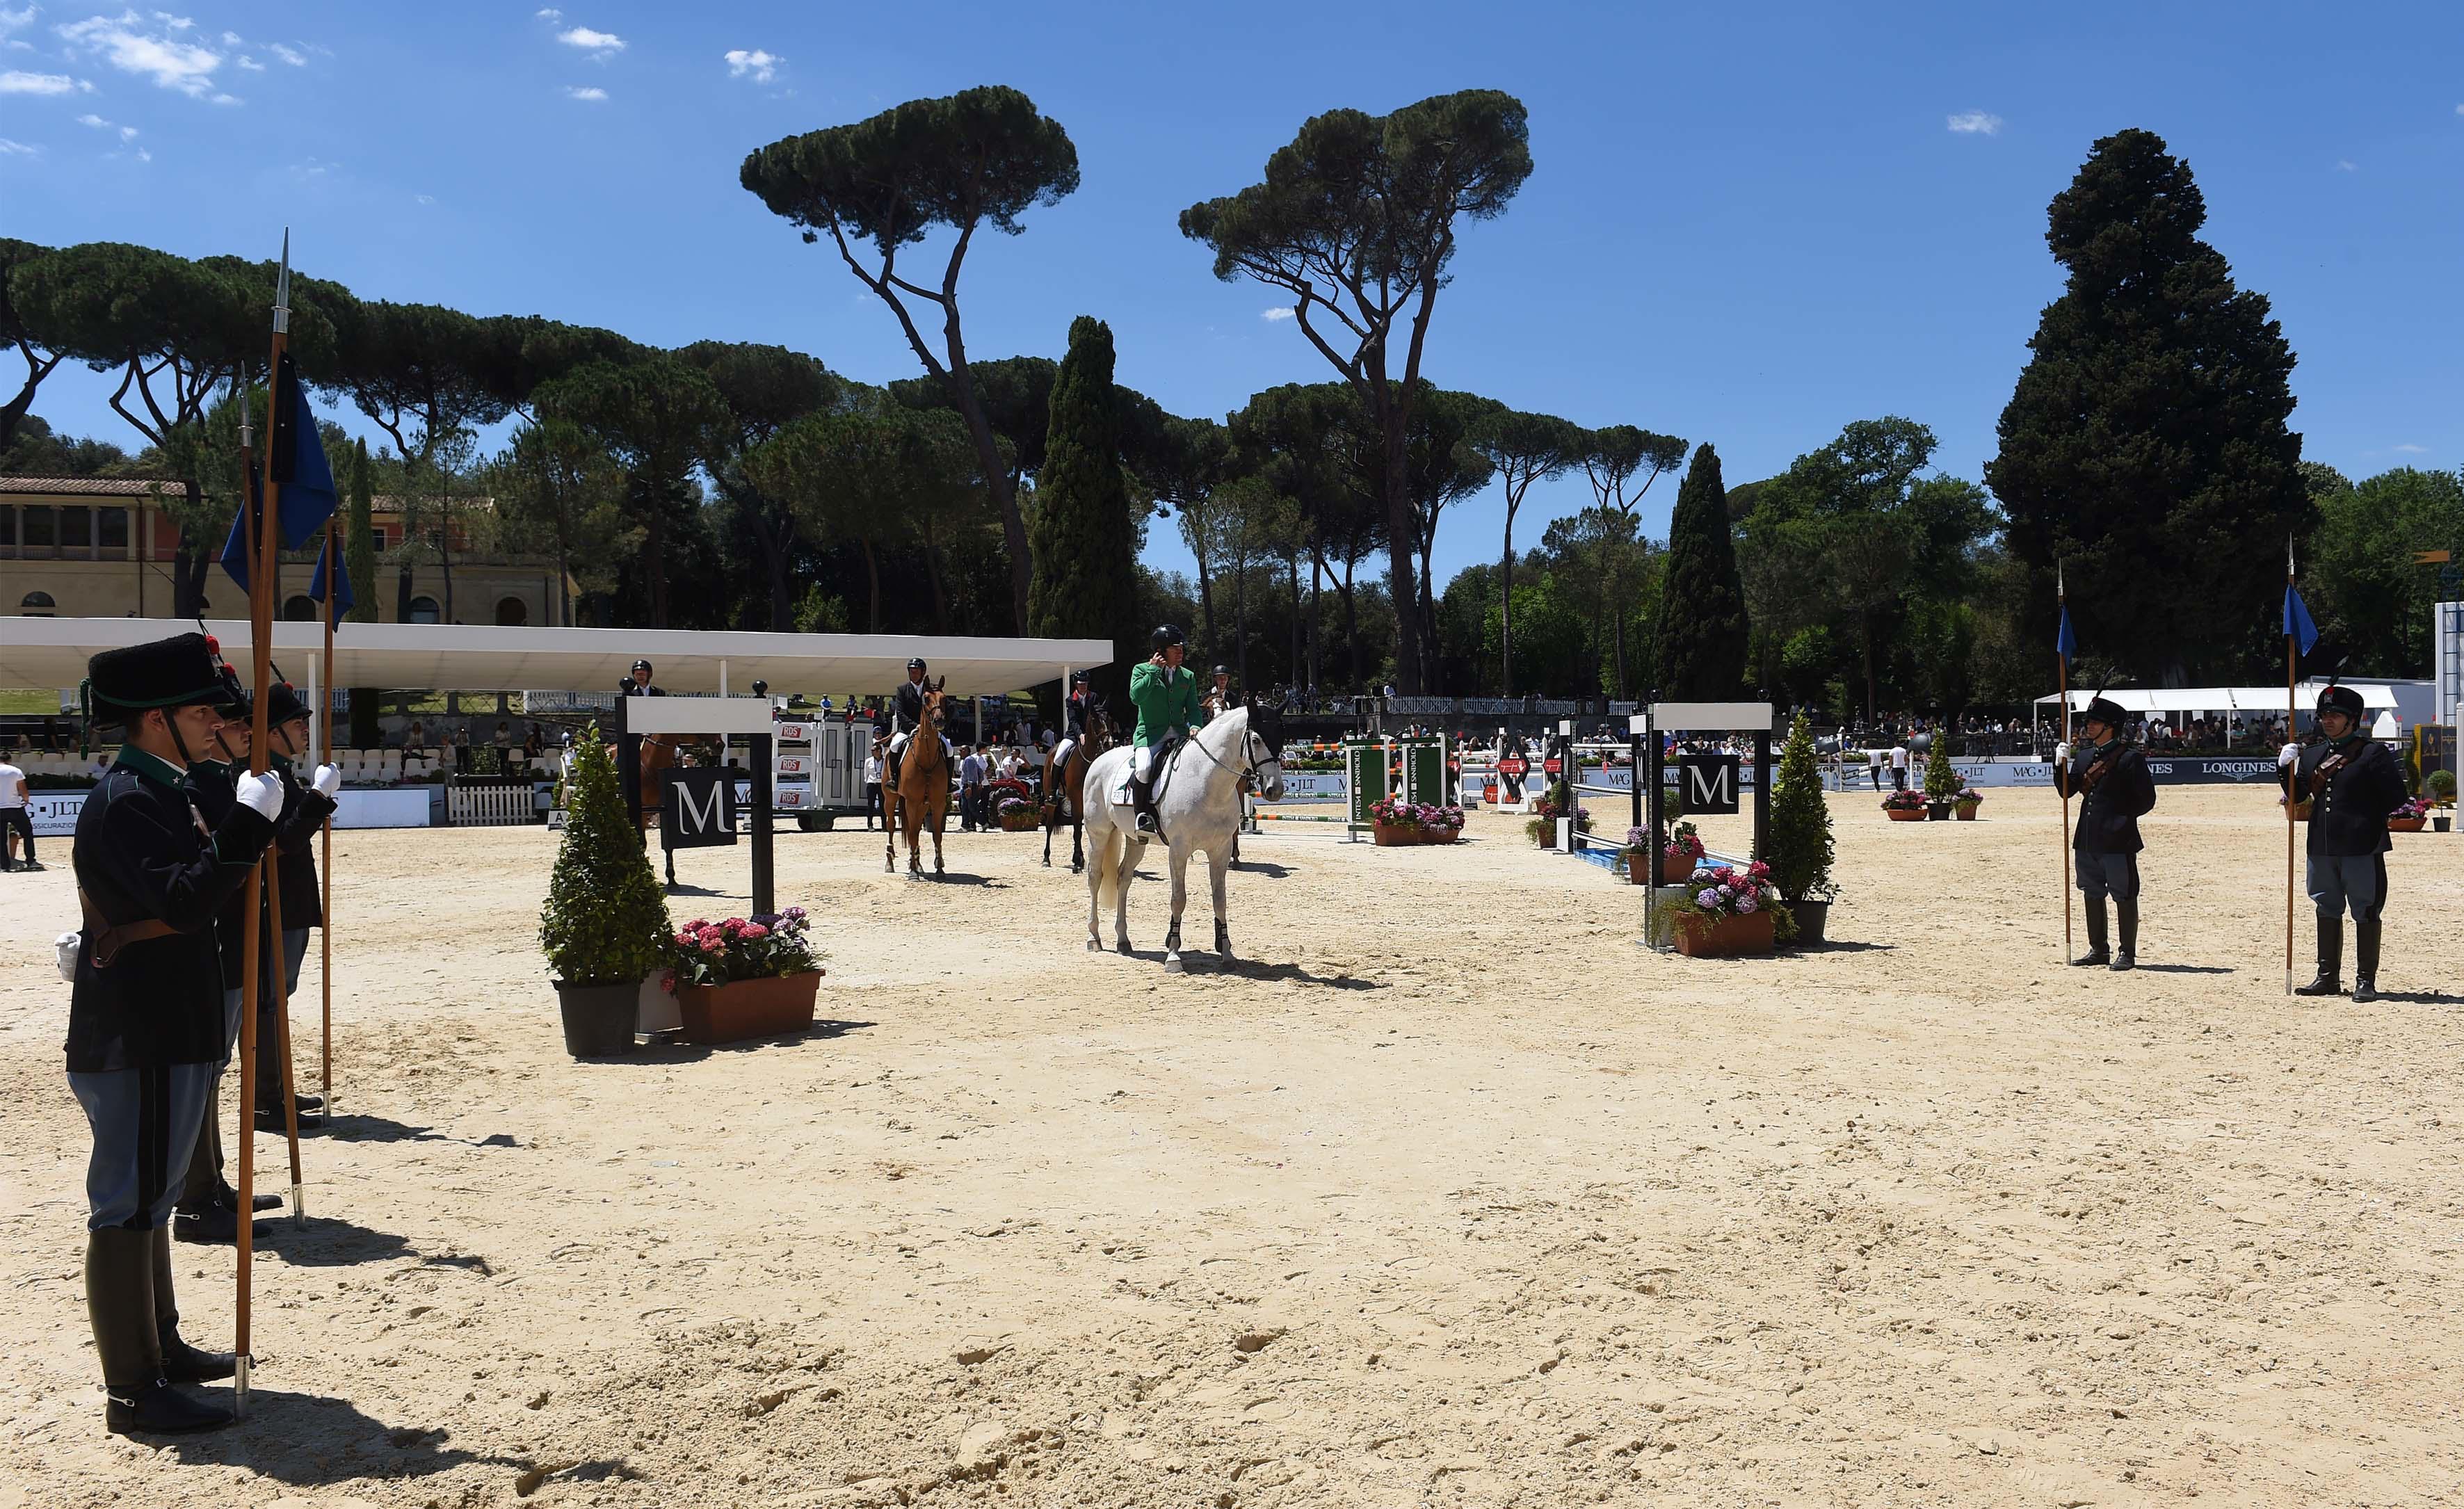 170526040 PiazzaDiSiena Foto Simone Ferraro - CONI